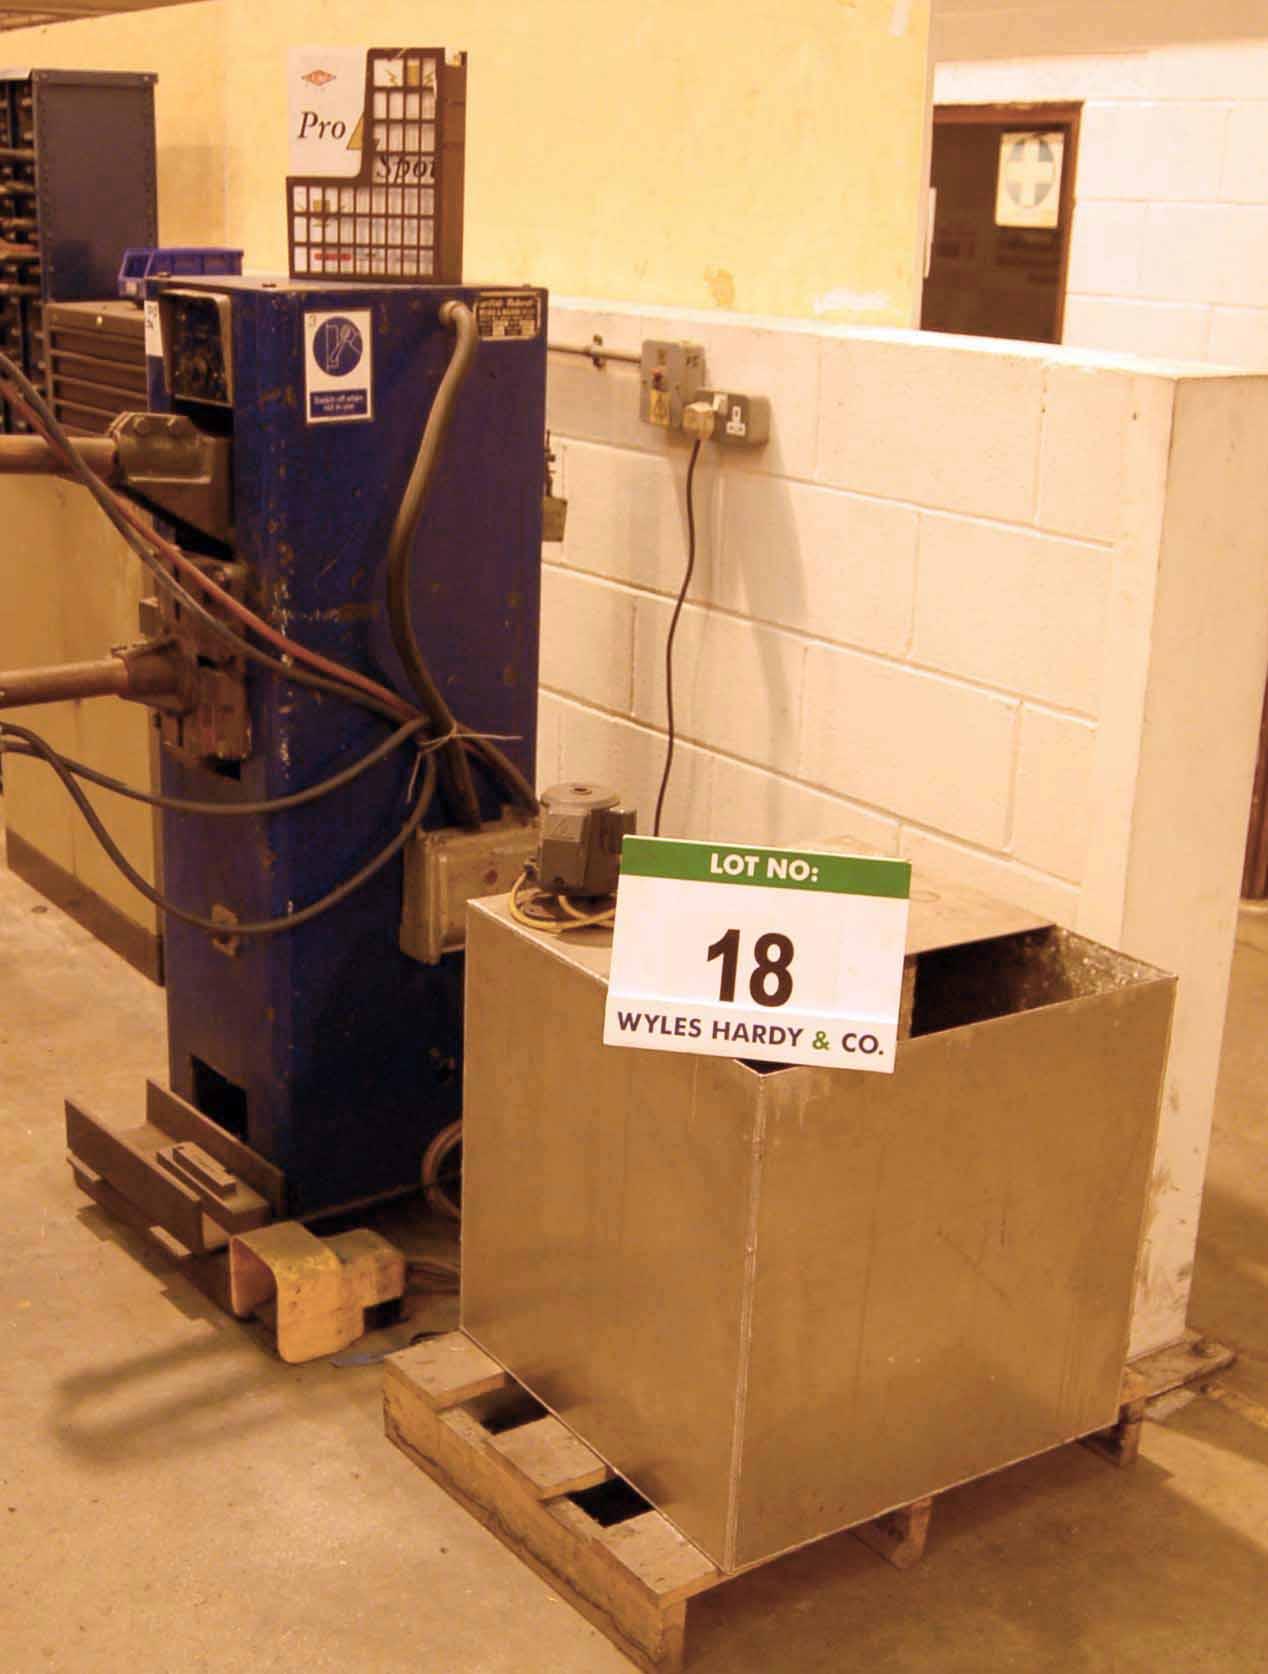 Lot 18 - A BRITISH FEDERAL Type W/6 17KVA Spot Welding Machine, Machine No. 14645 Serial No. 28137 (1981),